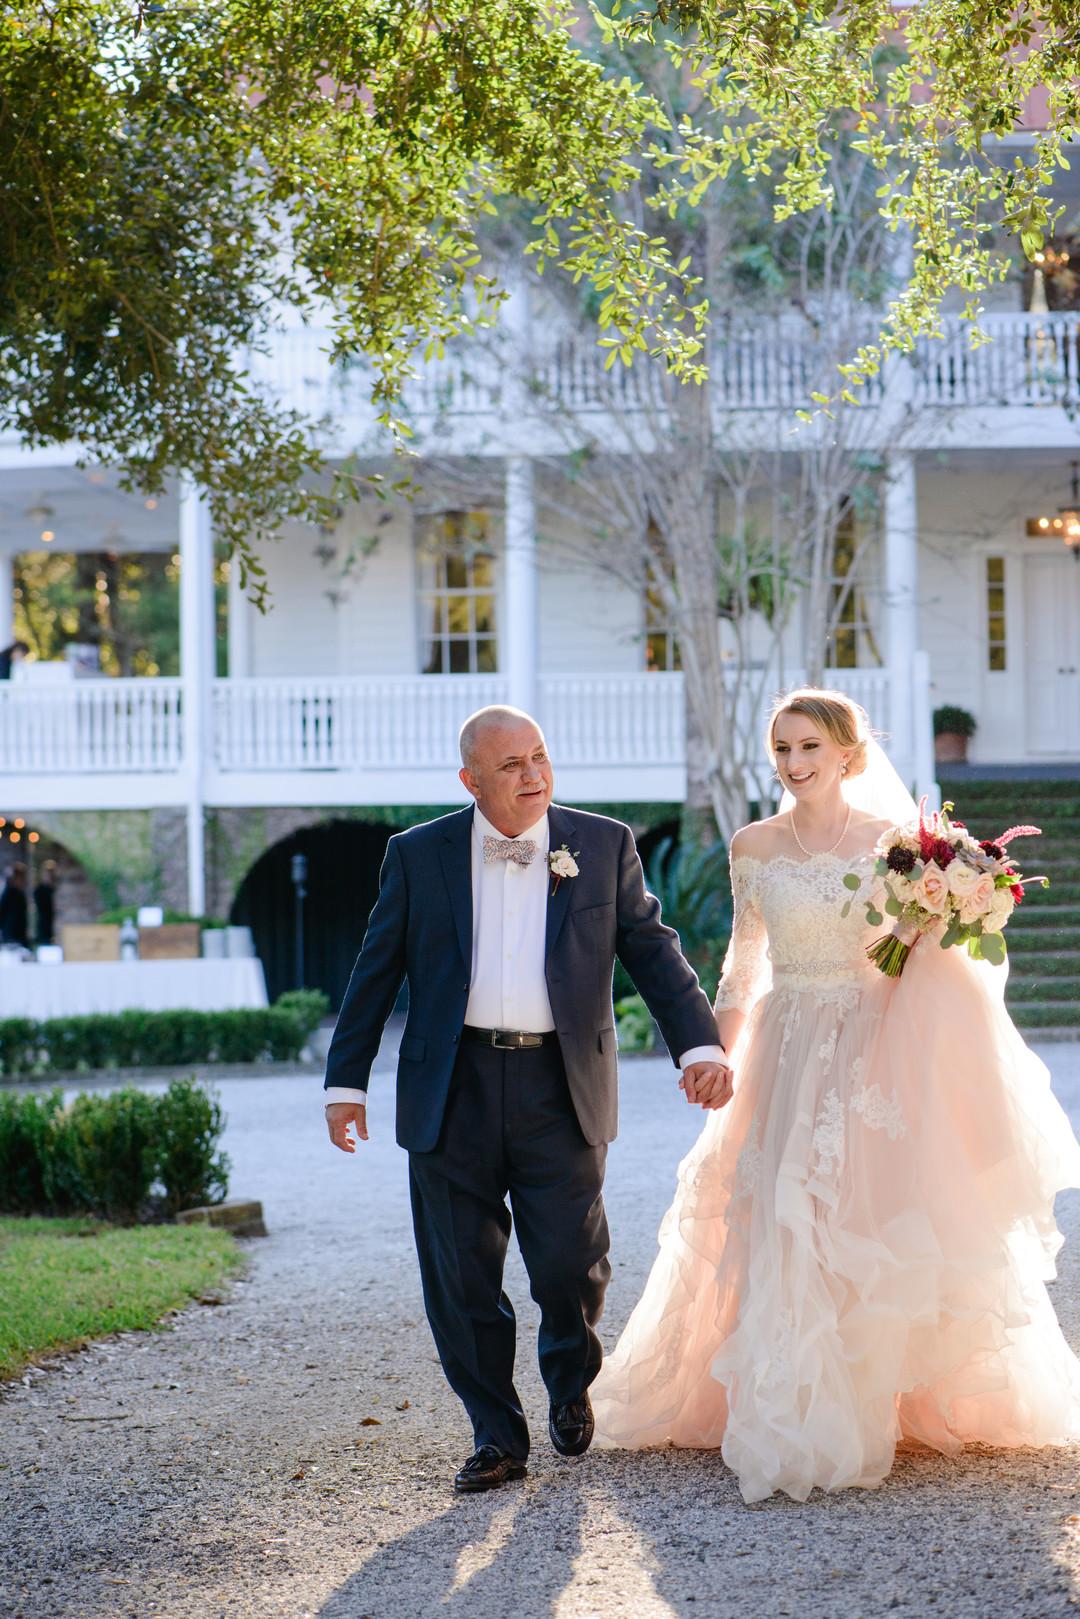 old-wide-awake-plantation-wedding-18.JPG